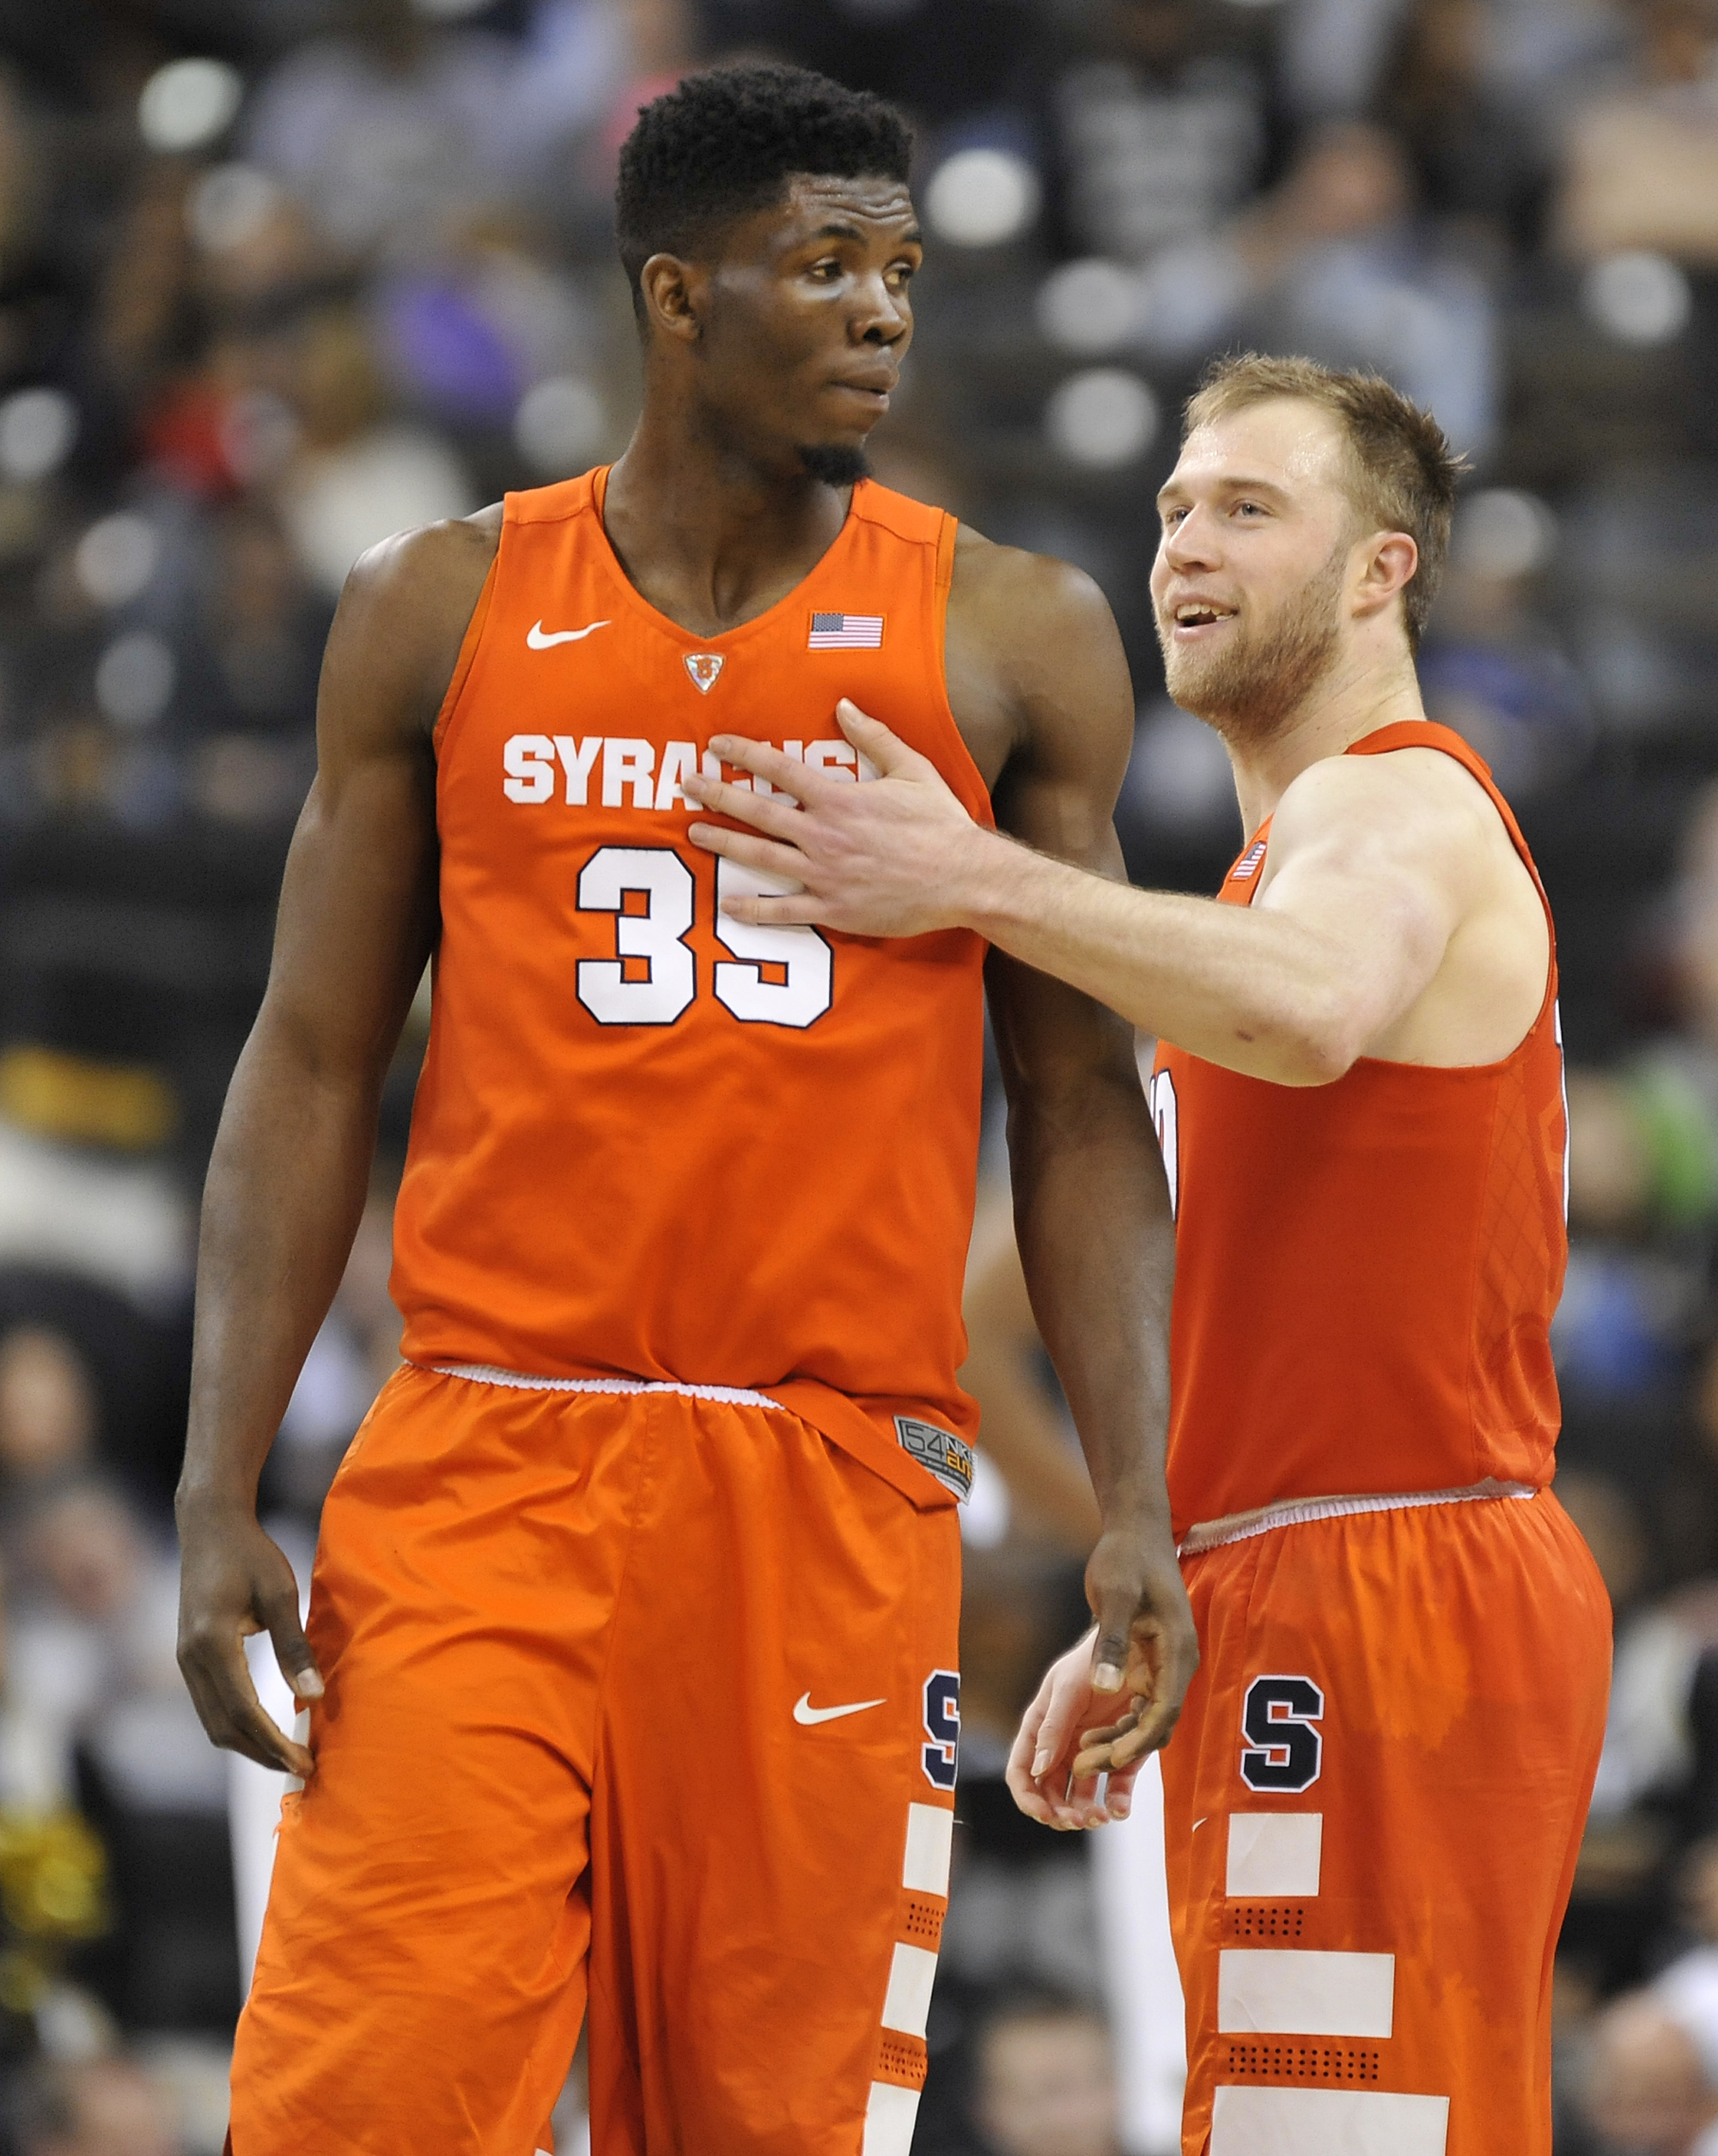 Syracuse guard Trevor Cooney (10) congratulates center Chinonso Obokoh (35) during an NCAA college basketball game at Joel Coliseum in Winston-Salem, N.C., Saturday Jan. 16, 2016.  (Bruce Chapman/The Winston-Salem Journal via AP) MANDATORY CREDIT  MBI(